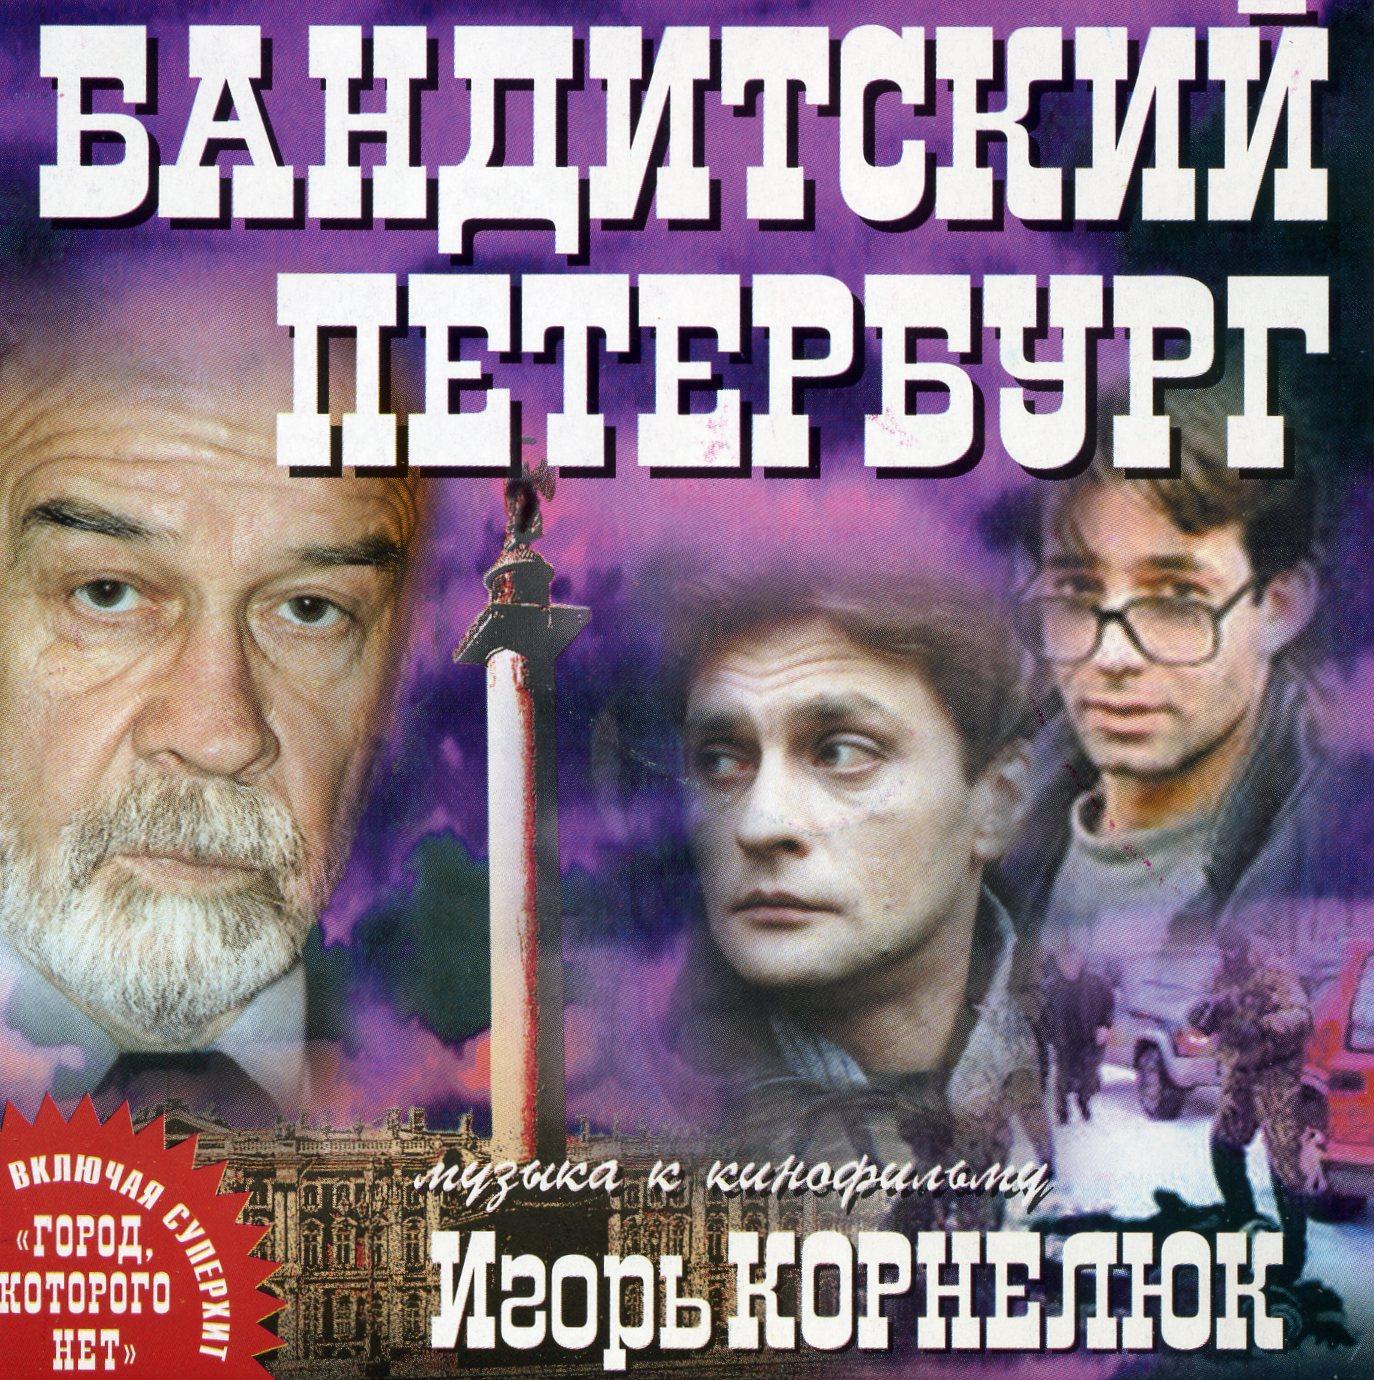 Бандитский Петербург, OST, 2001, mp3, слушать онлайн/online, 12+